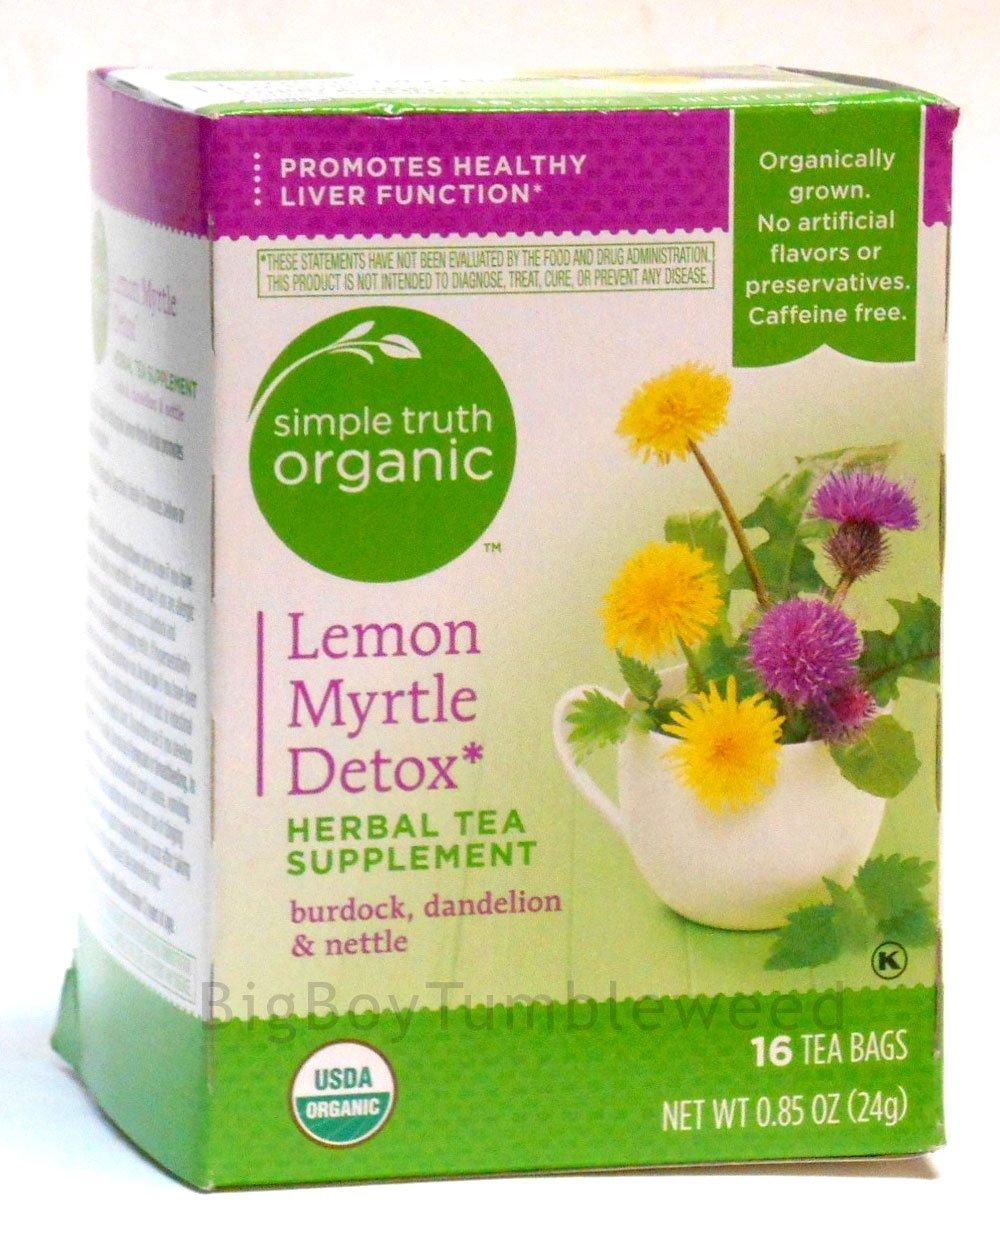 Simple Truth Tea Lemon Myrtle Detox herbal supplement TEA 16 bags burdock dandelion